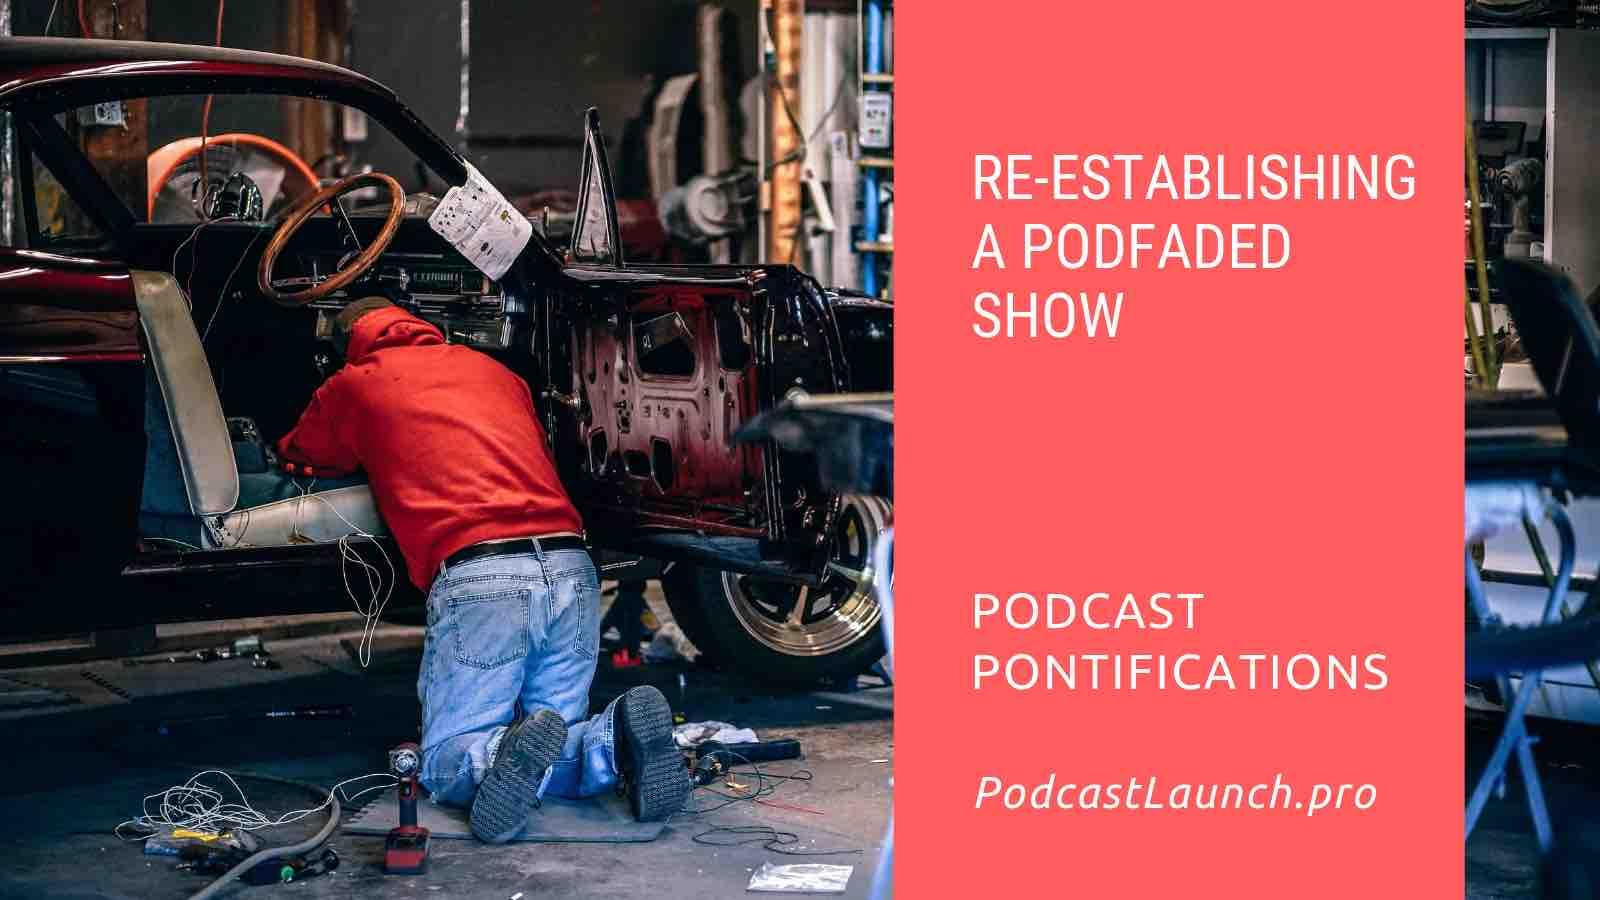 Re-Establishing A Podfaded Podcast